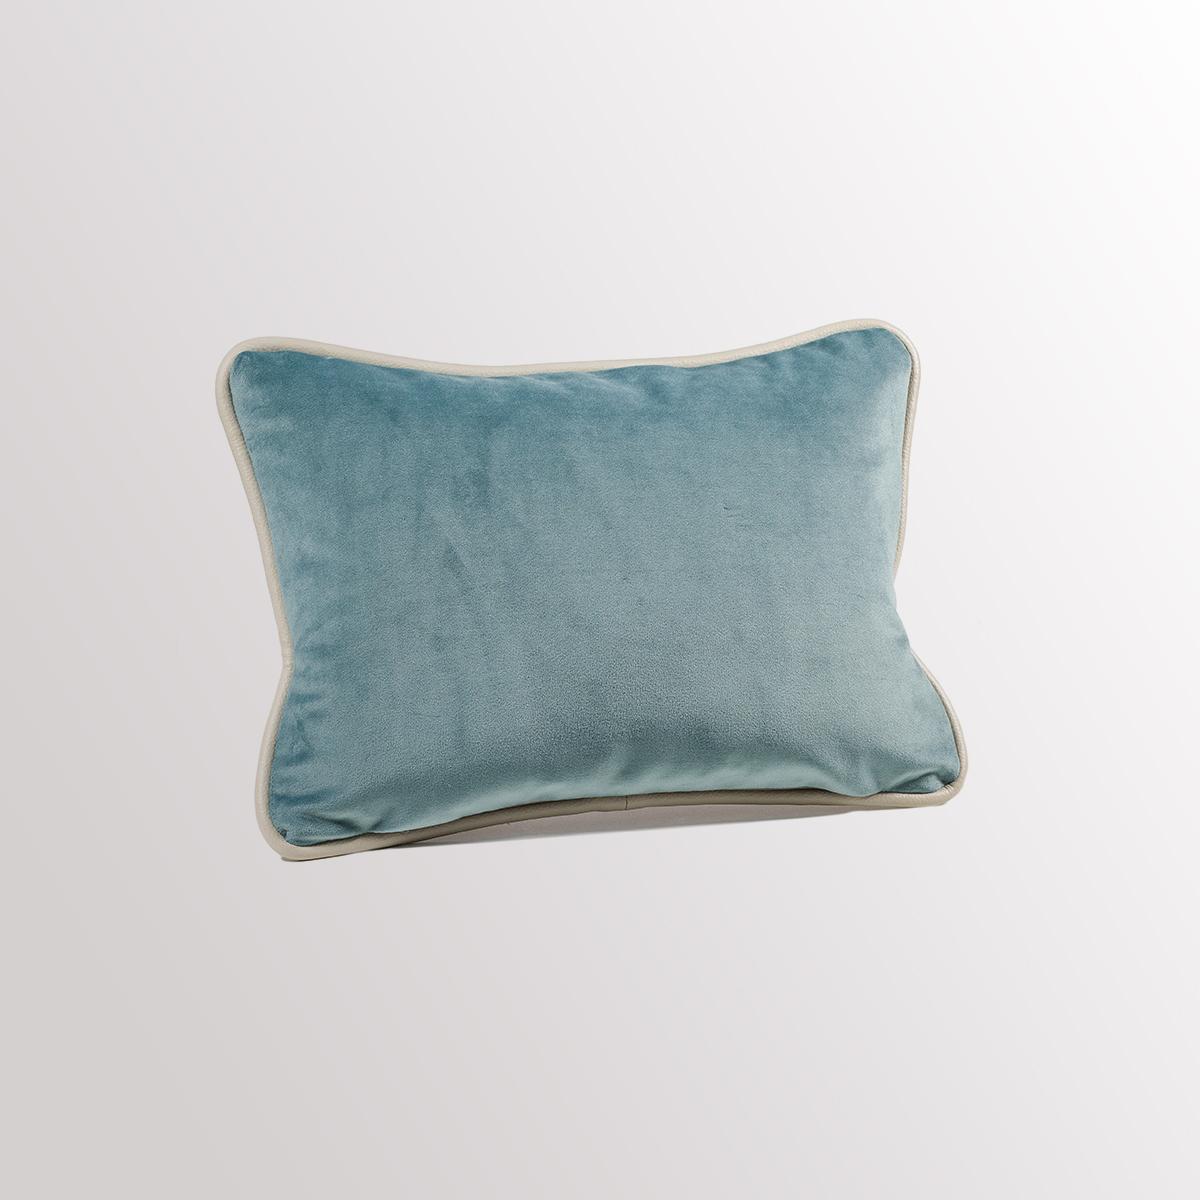 almofada decorativa pequena Almofada decorativa pequena colunex decor pillow small 01